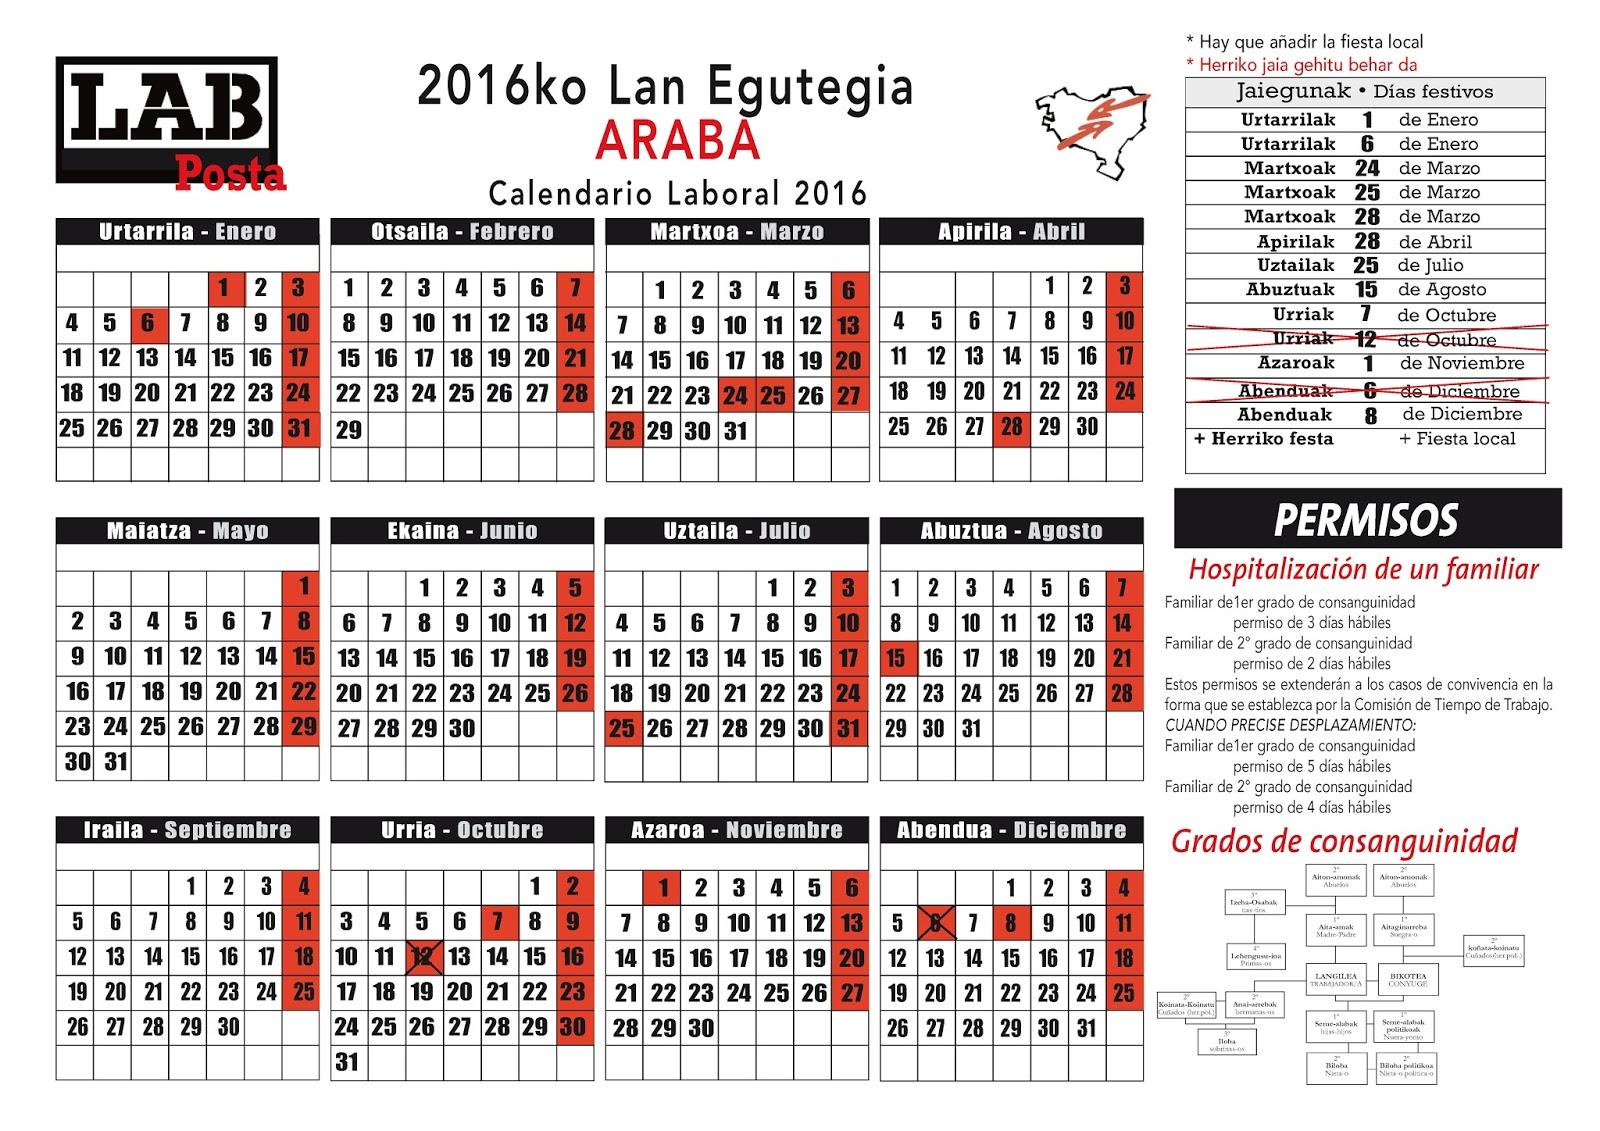 Calendario Laboral Alava 2020.Lab Posta 2016ko Lan Egutegia Araba Calendario Laboral 2016 Alava